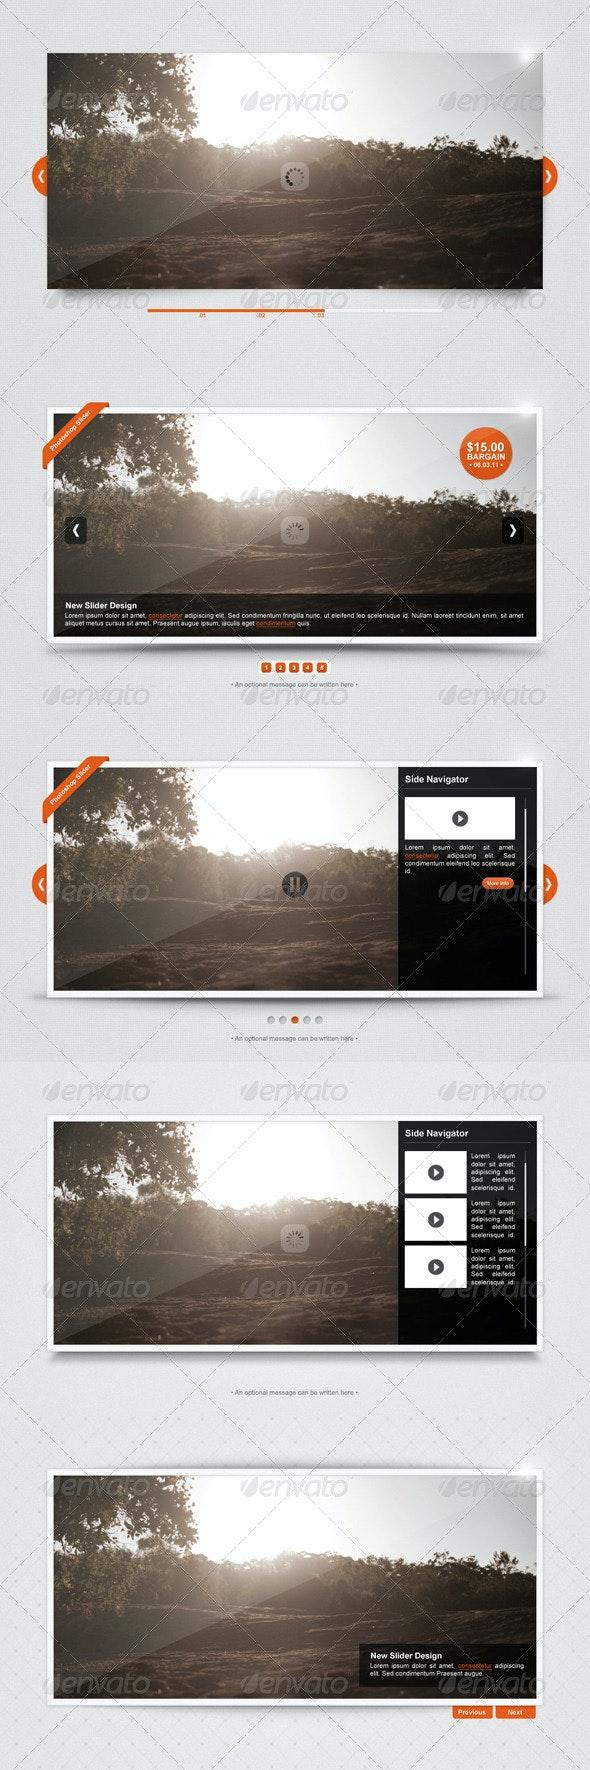 Sleek Image Slider - Sliders & Features Web Elements